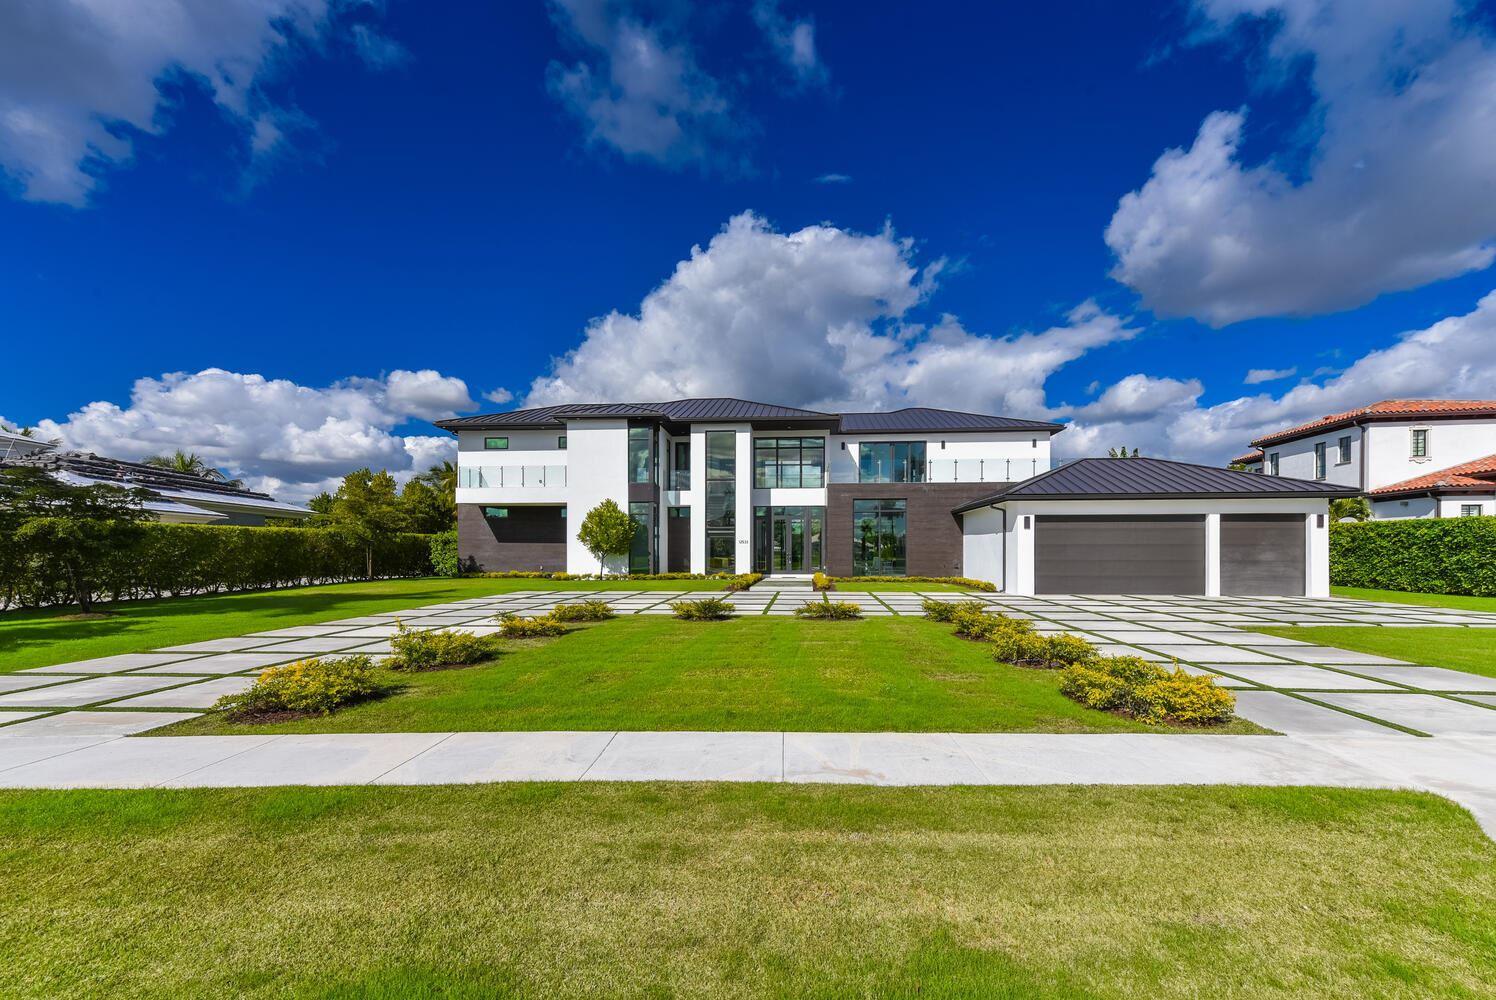 Photo of 12533 Cypress Island Way, Wellington, FL 33414 (MLS # RX-10716106)